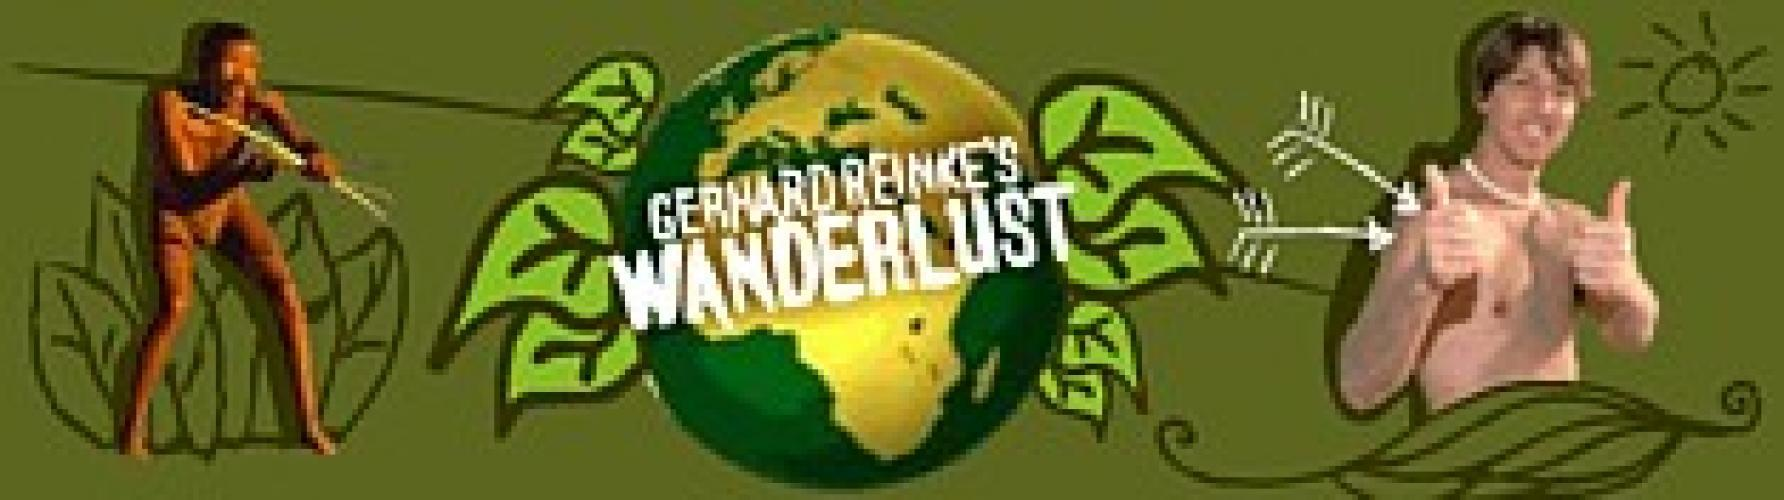 Gerhard Reinke's Wanderlust next episode air date poster